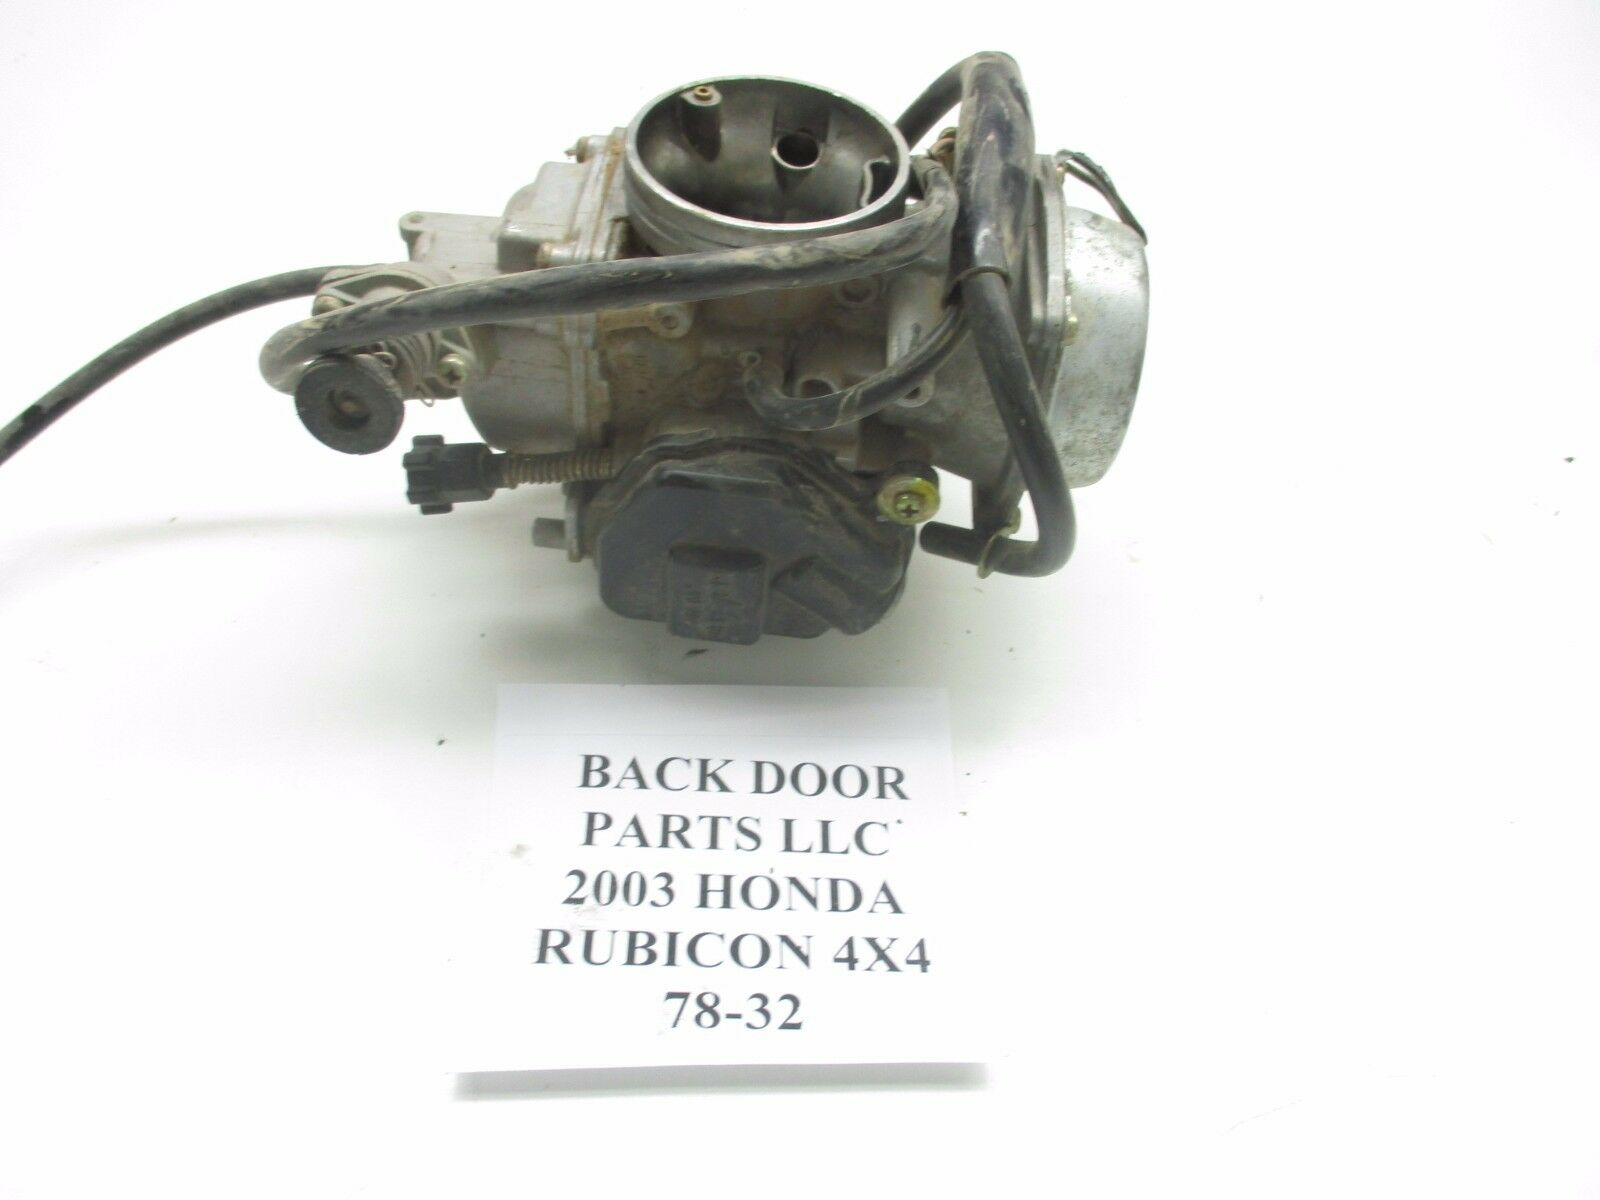 01 Honda Foreman Rubicon 500 4x4 Carburetor Carb Trx500fa Ebay Fuel Filter